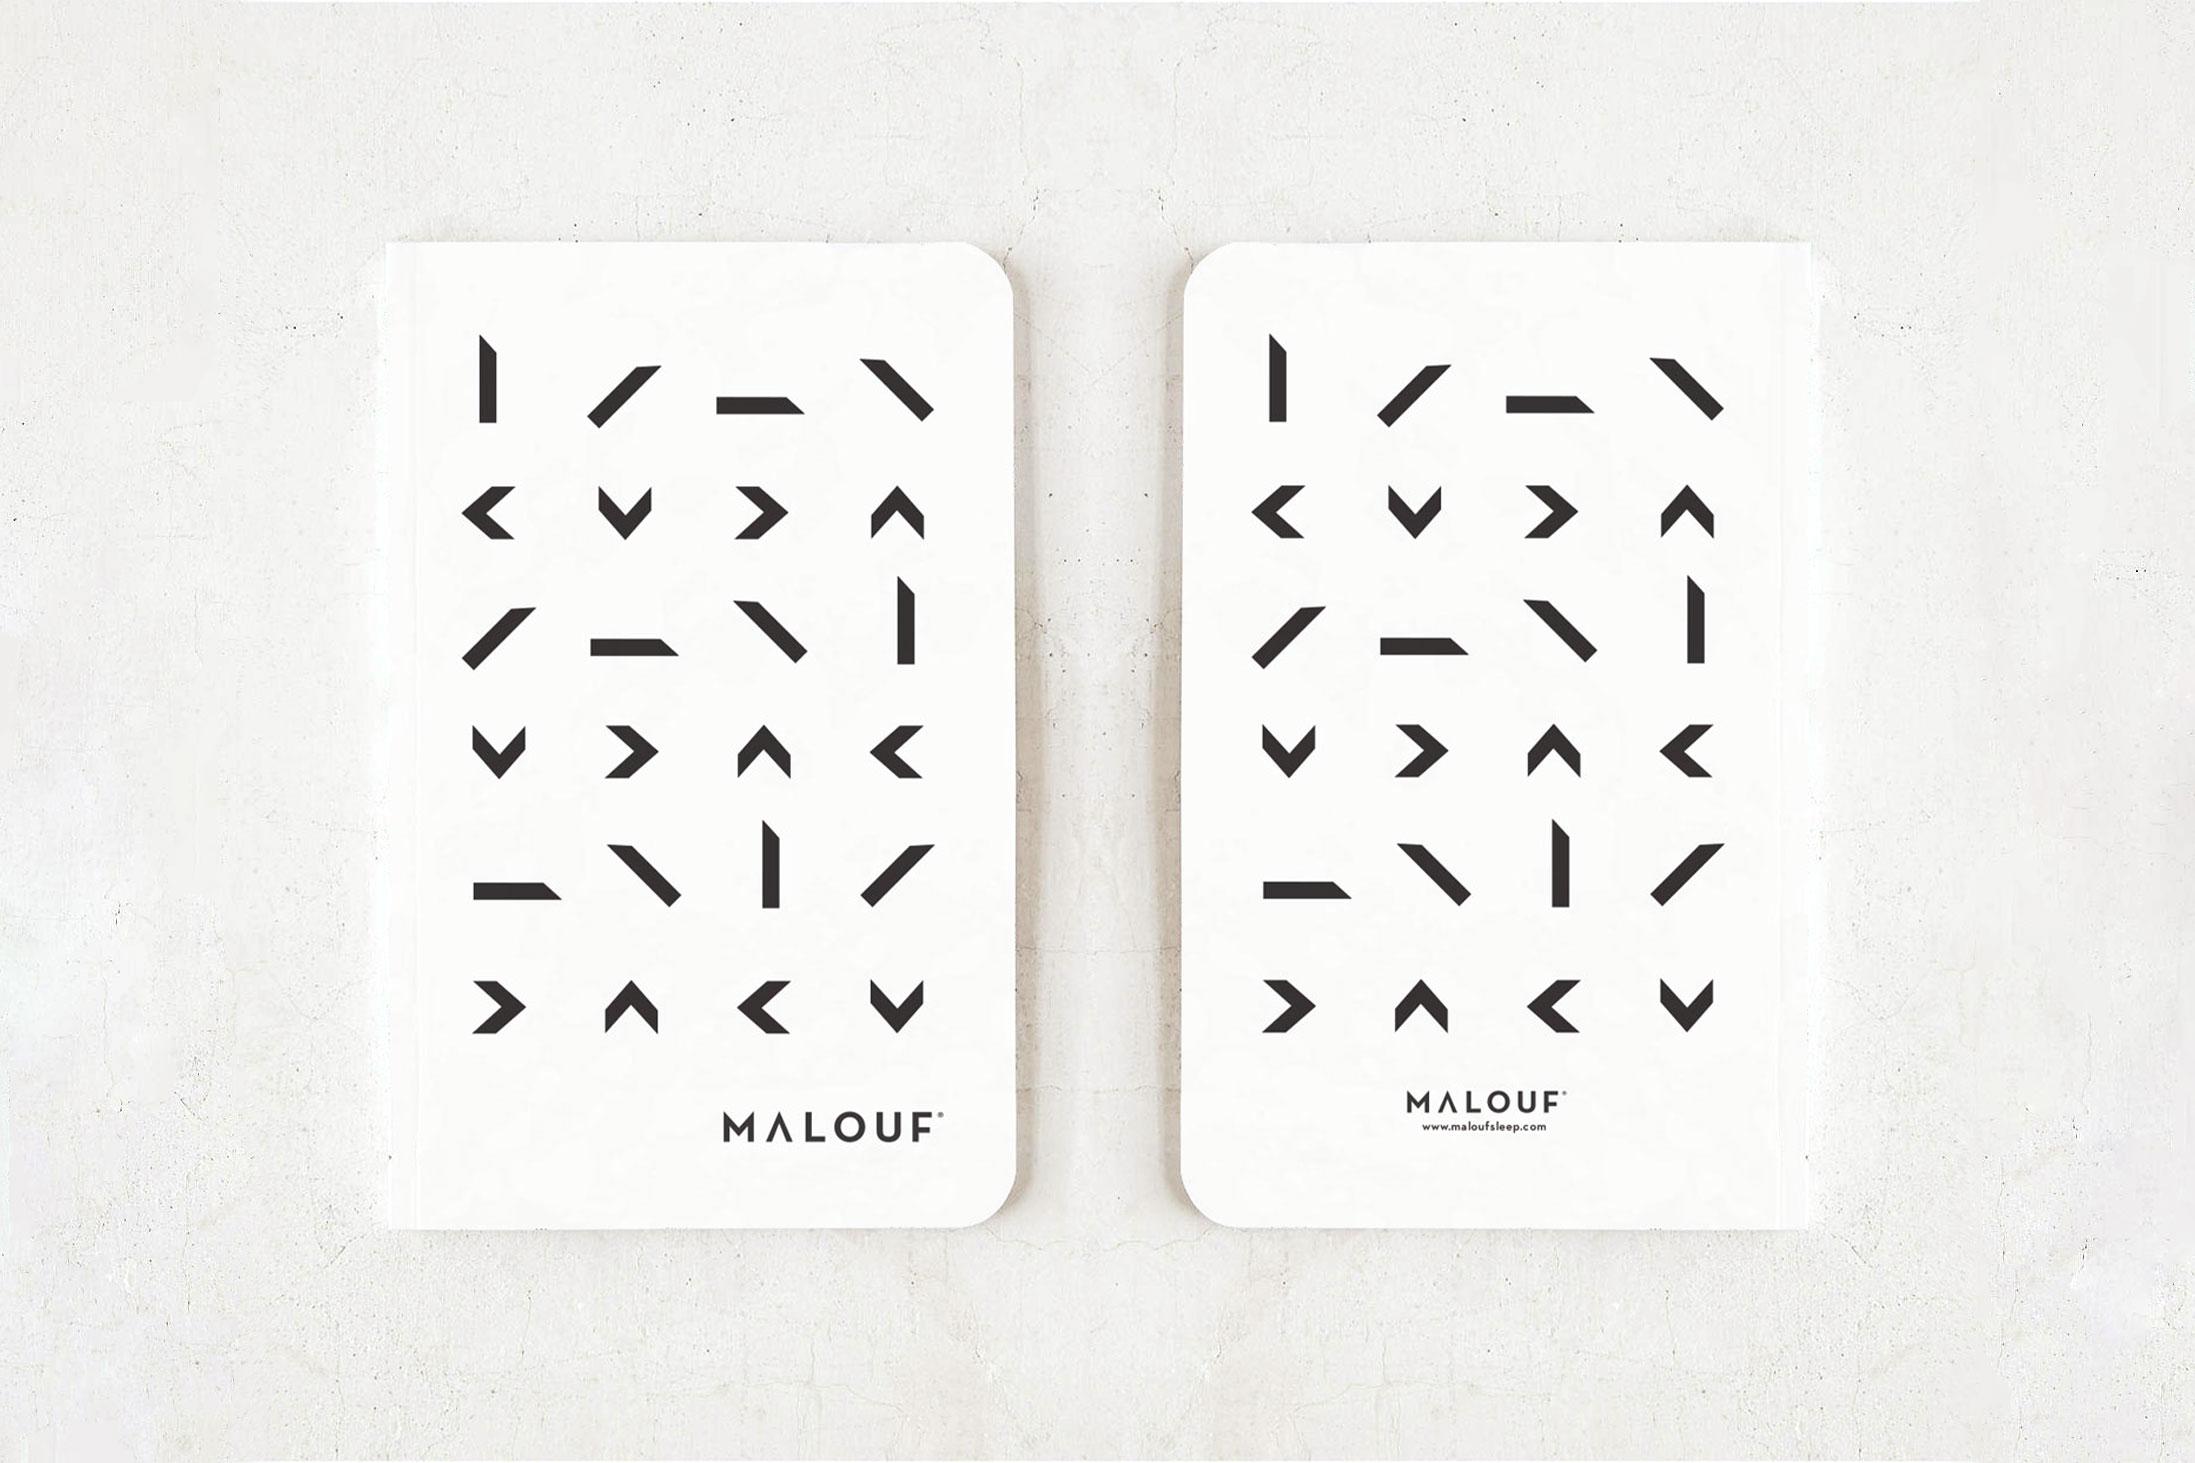 MALOUF_Notebooks_Option3.jpg